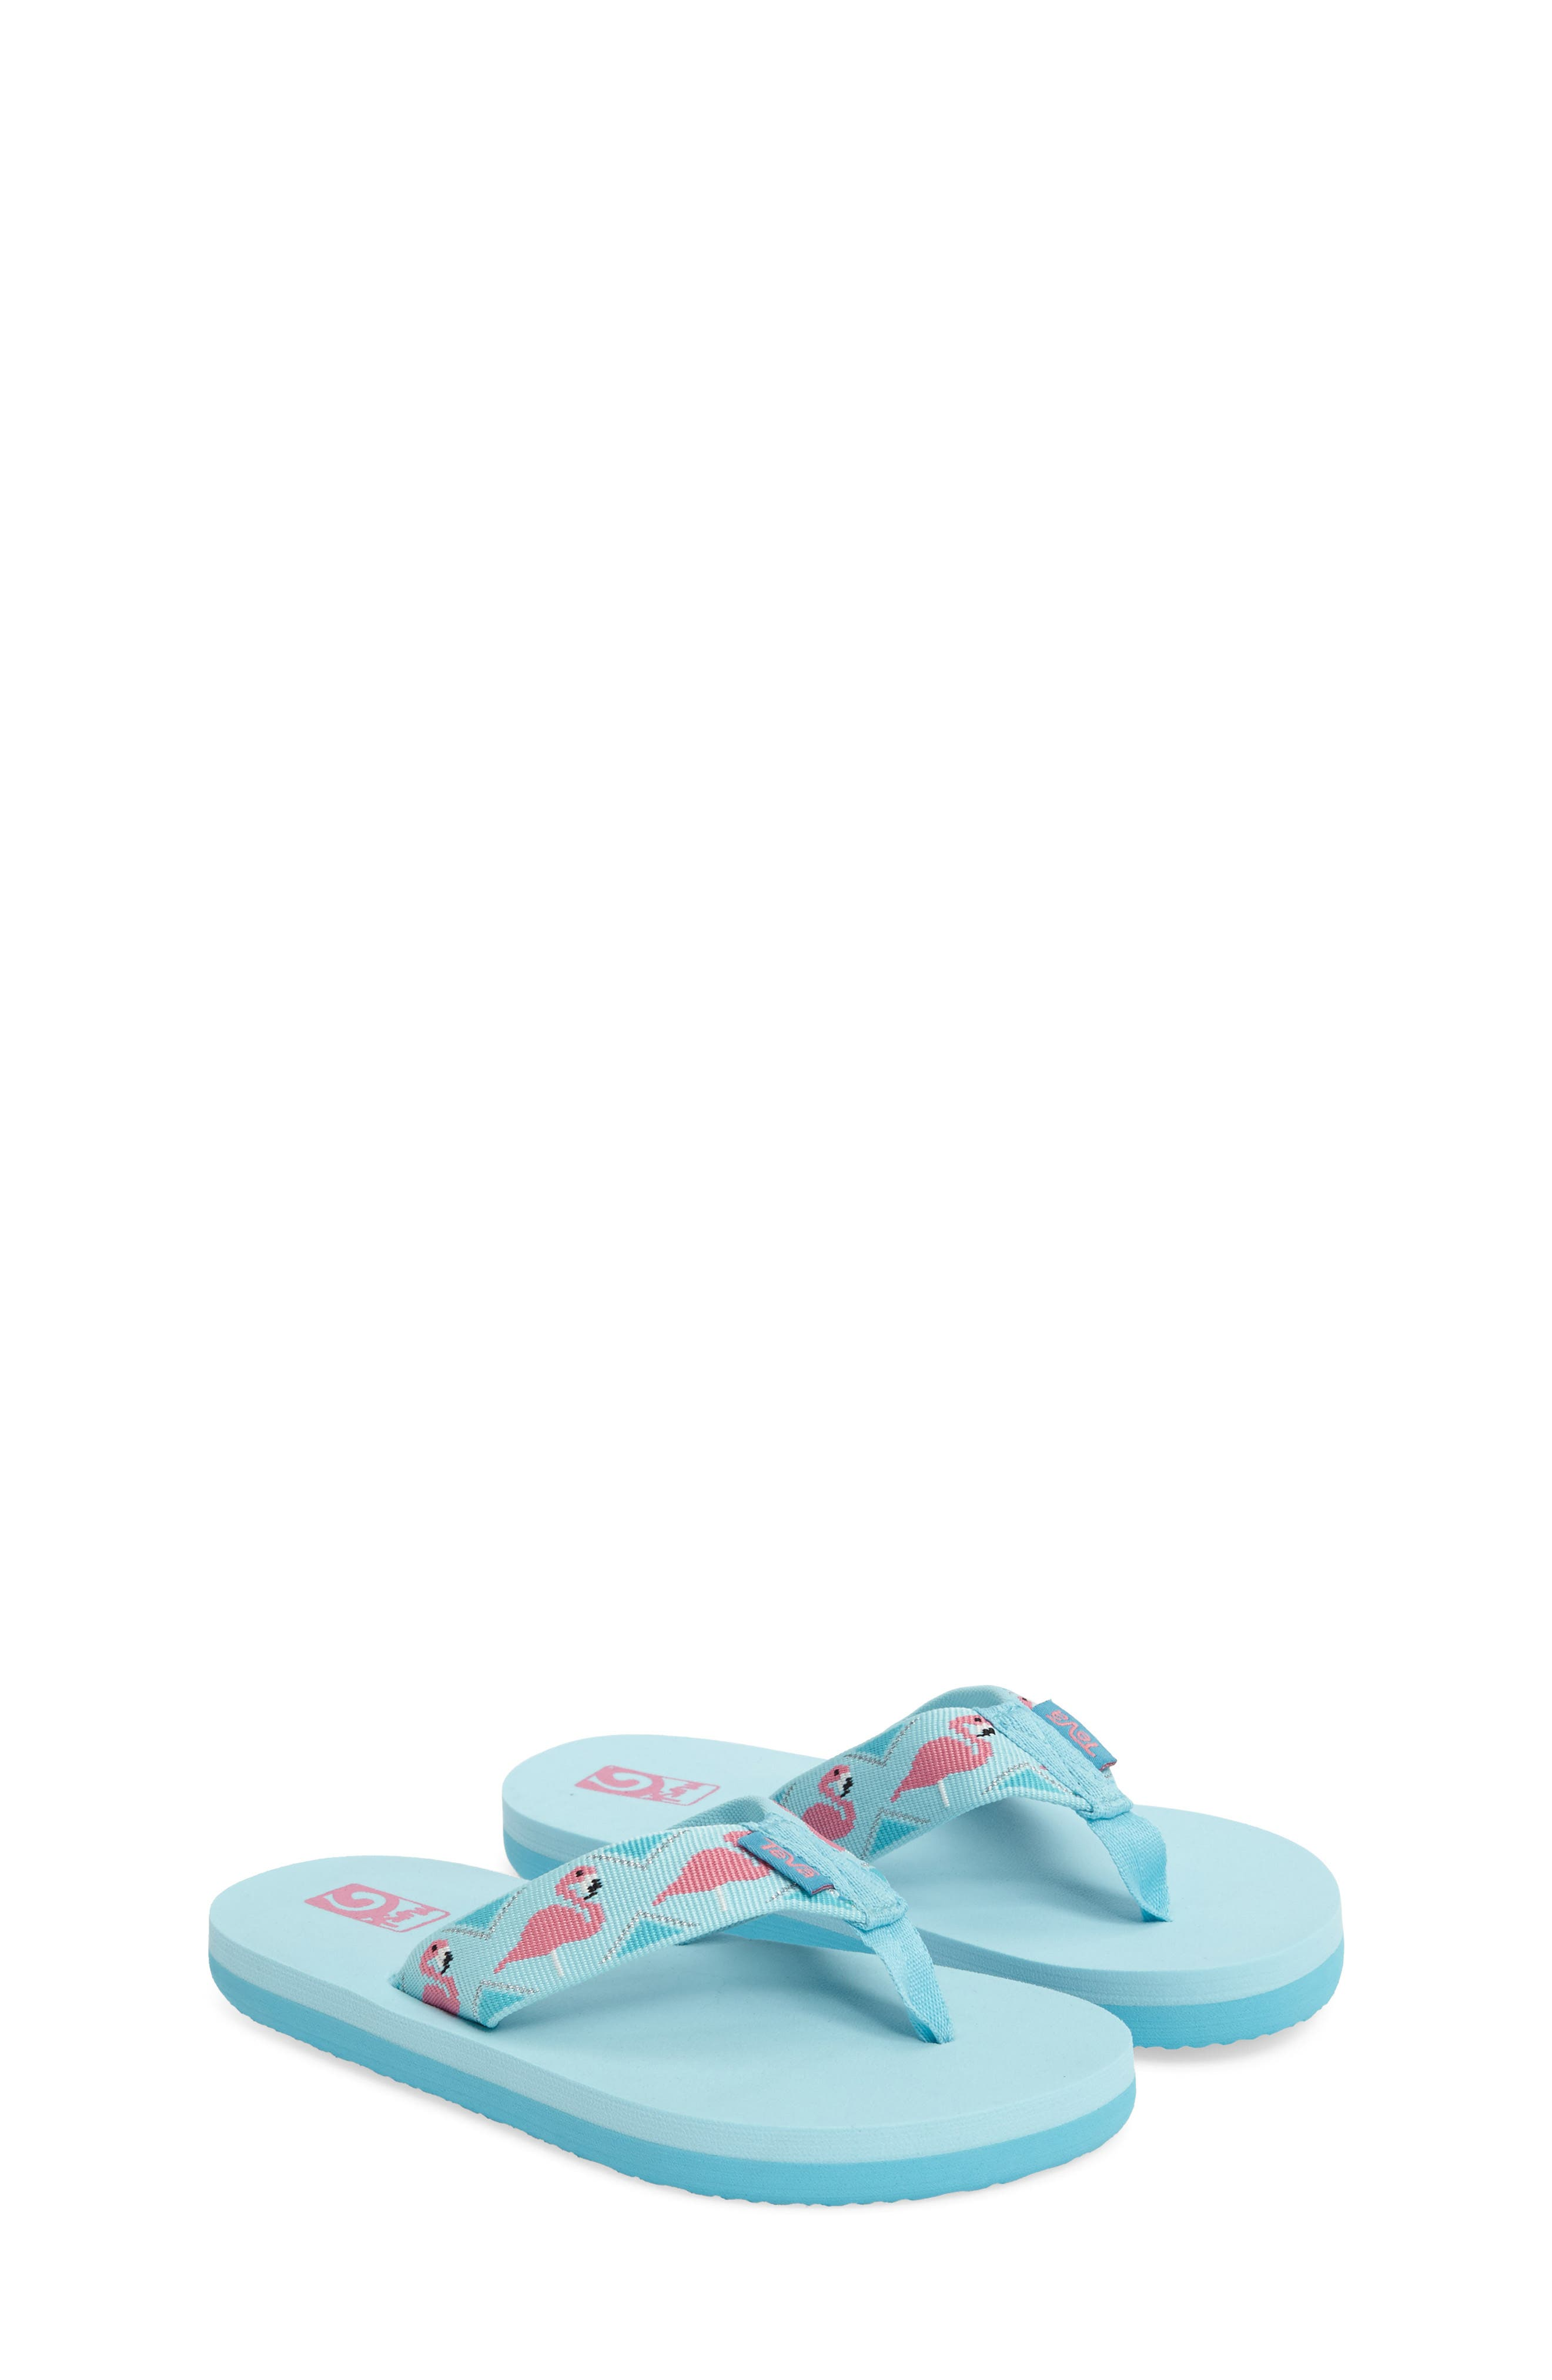 Teva Mush II Flip Flop (Baby, Walker & Toddler)